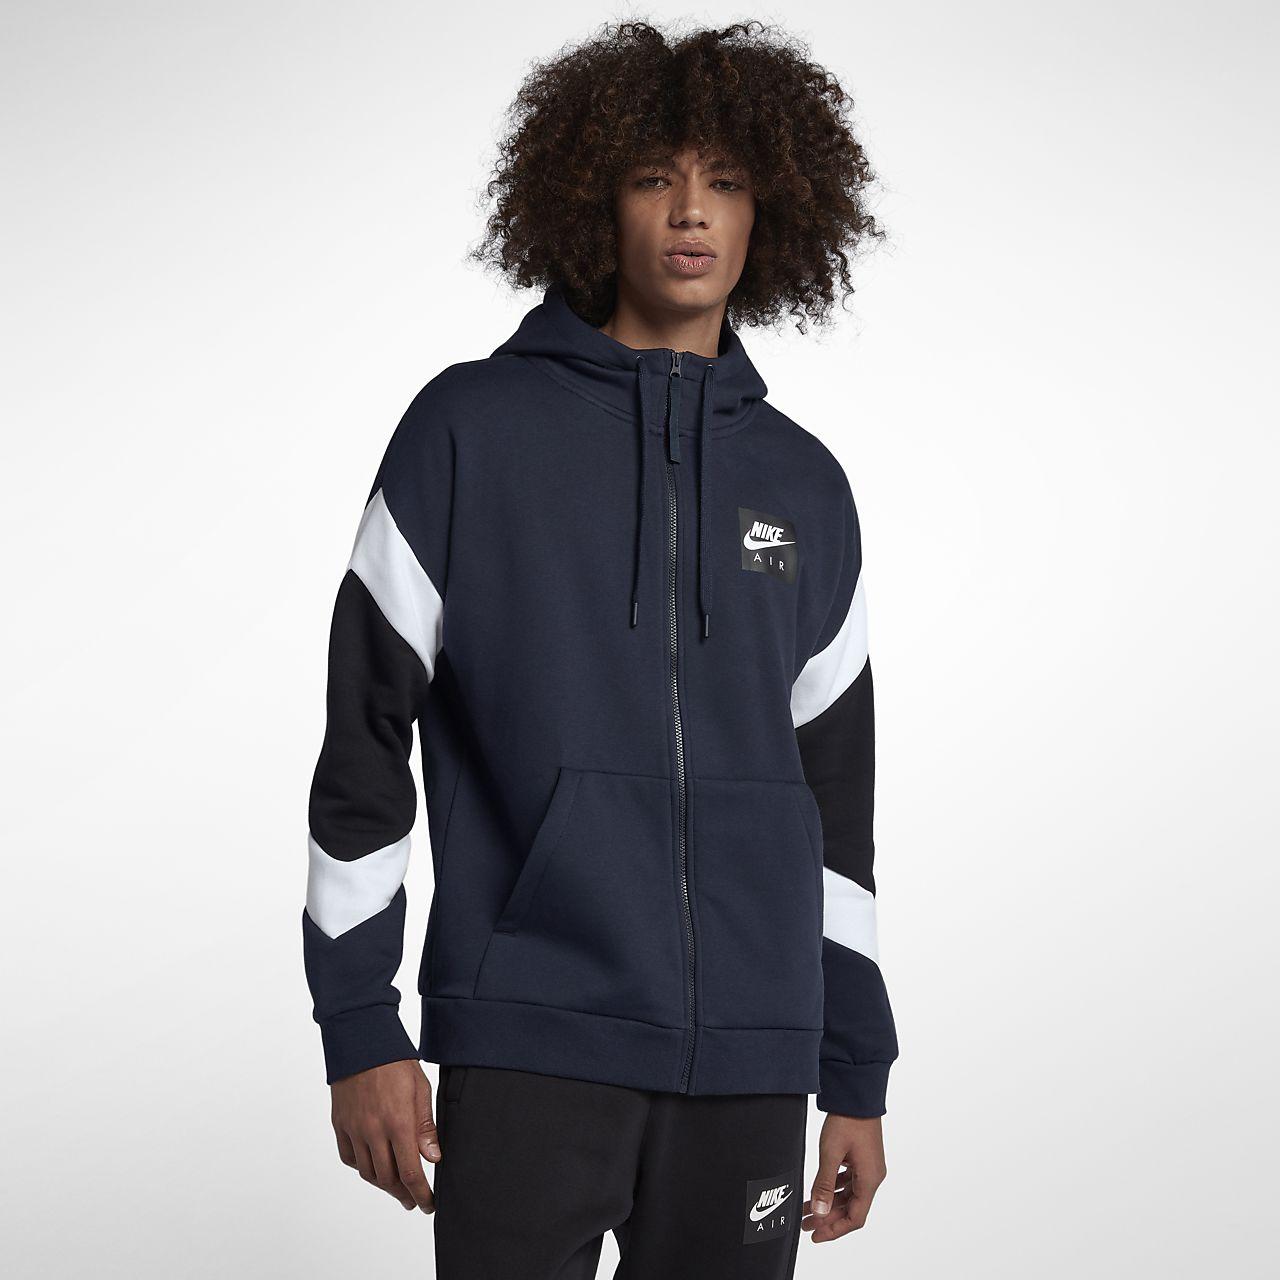 5fa6263af90f Nike Sportswear Air Men s Full-Zip Hoodie. Nike.com NO